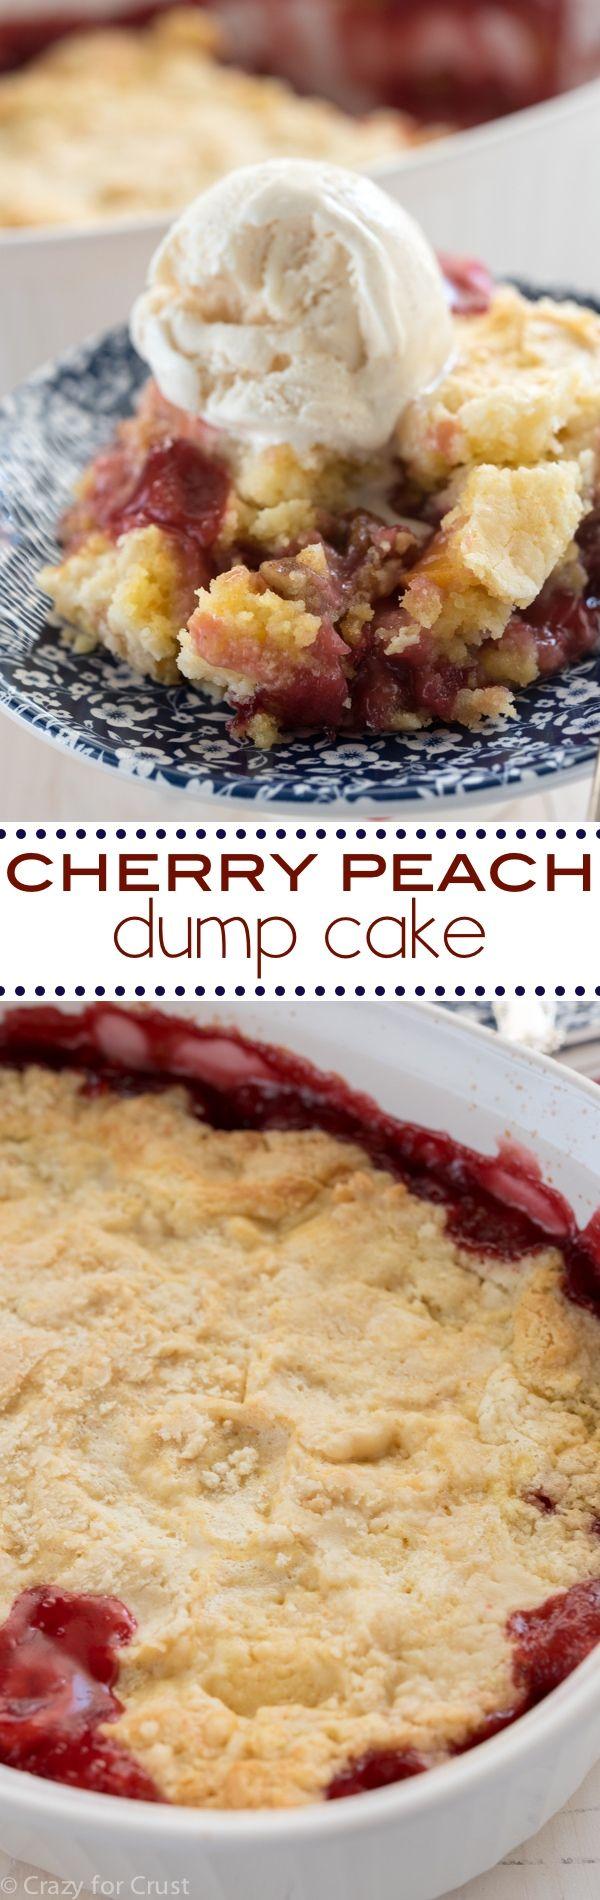 Easy Cheap Cake Recipes